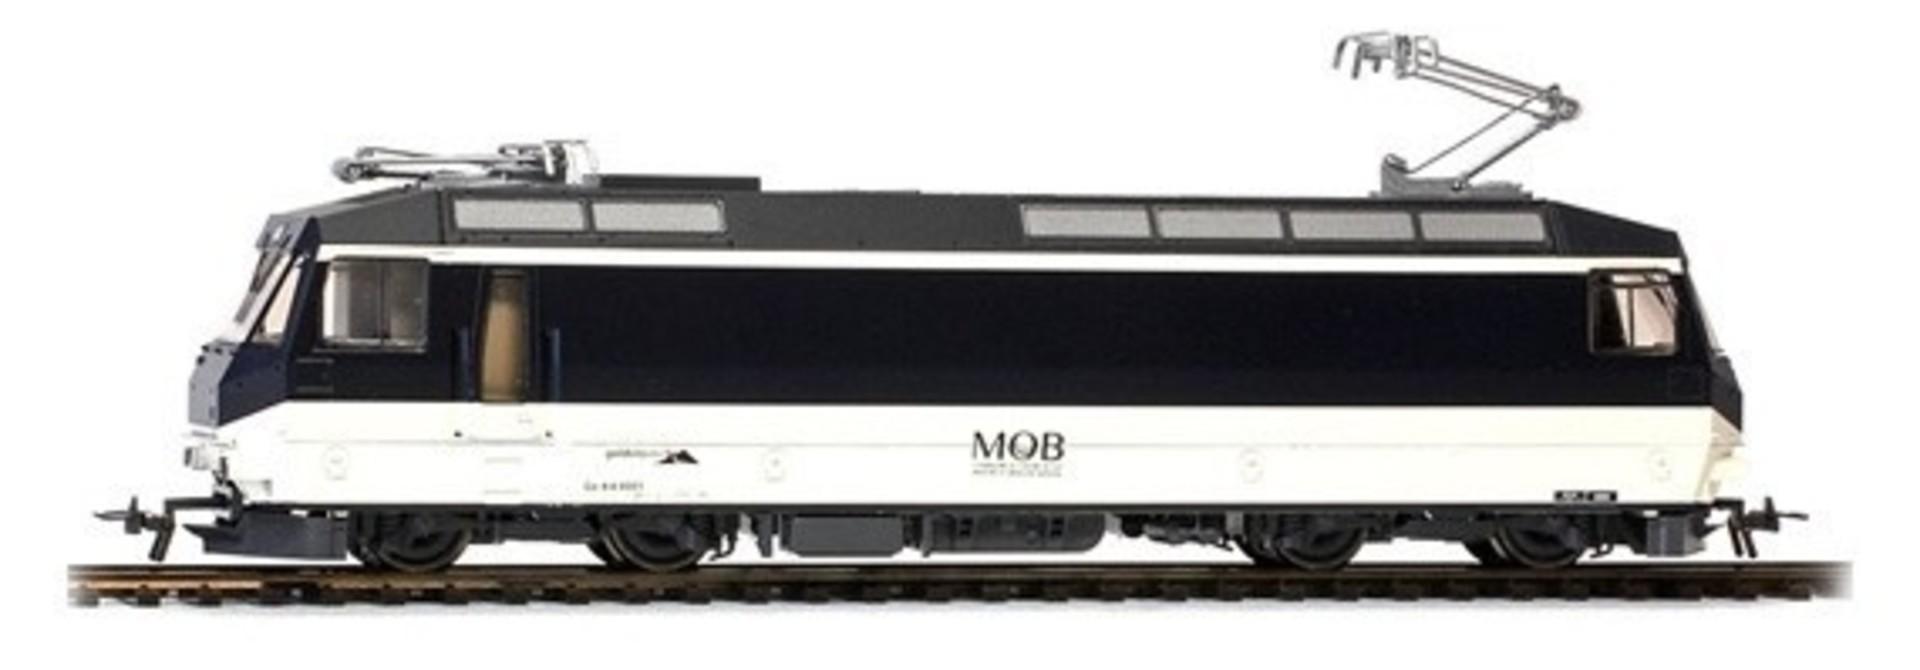 1259351 MOB Ge 4/4 8001 Universallok nachtblau/beige